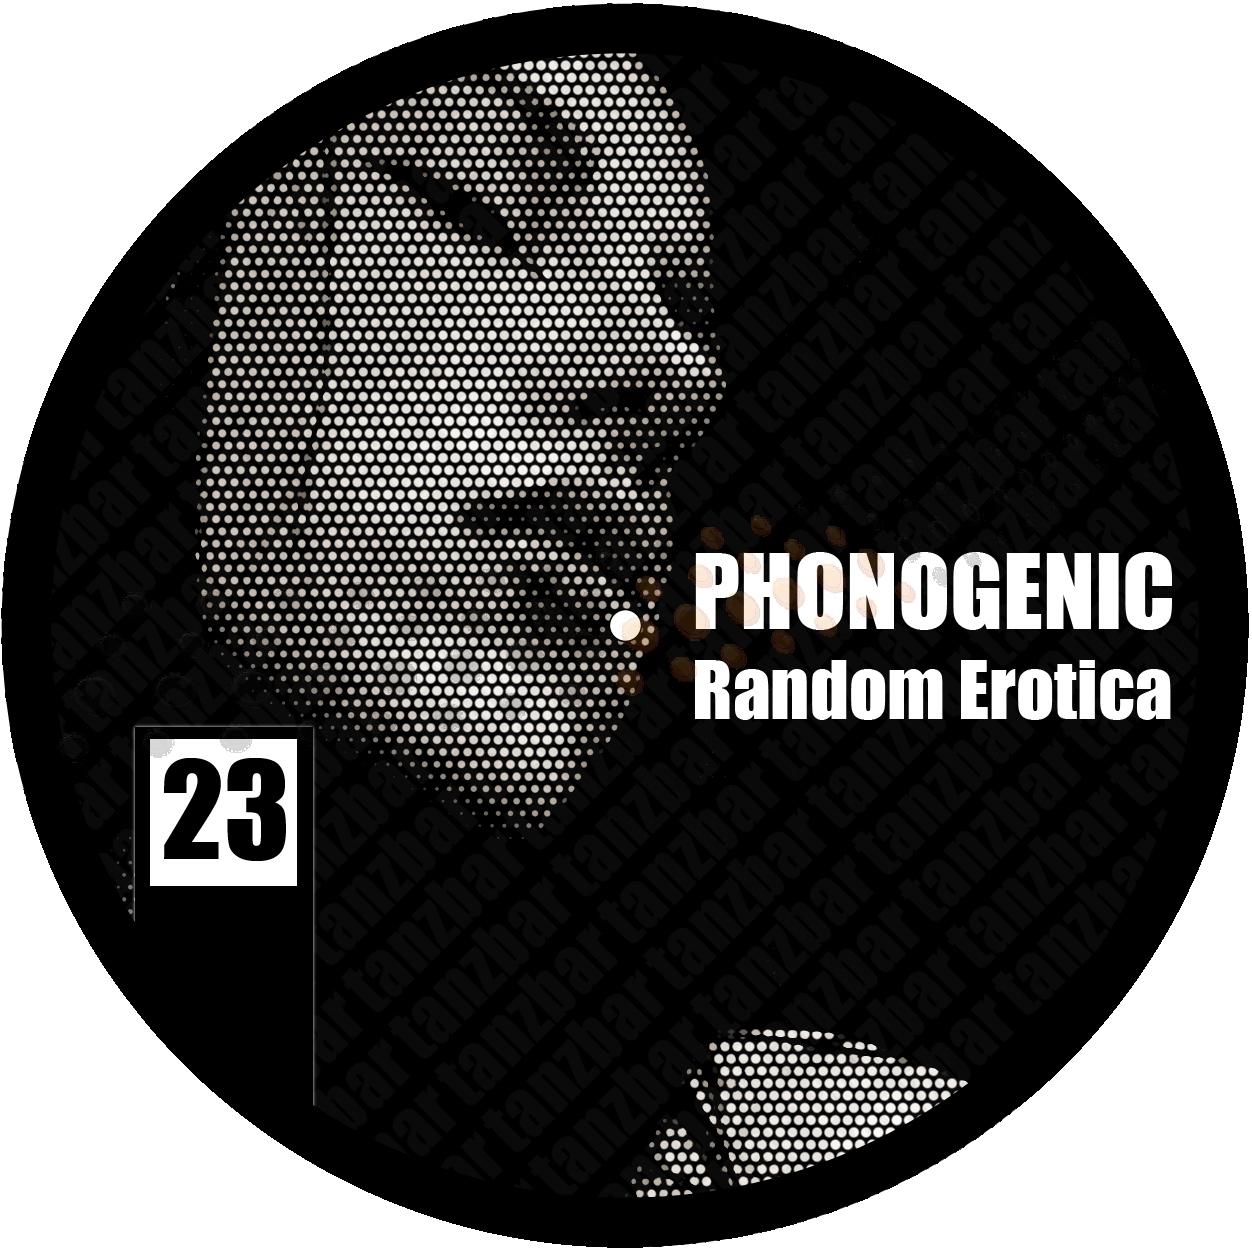 http://inevil.com/wp-content/uploads/2011/02/Phonogenic.jpg